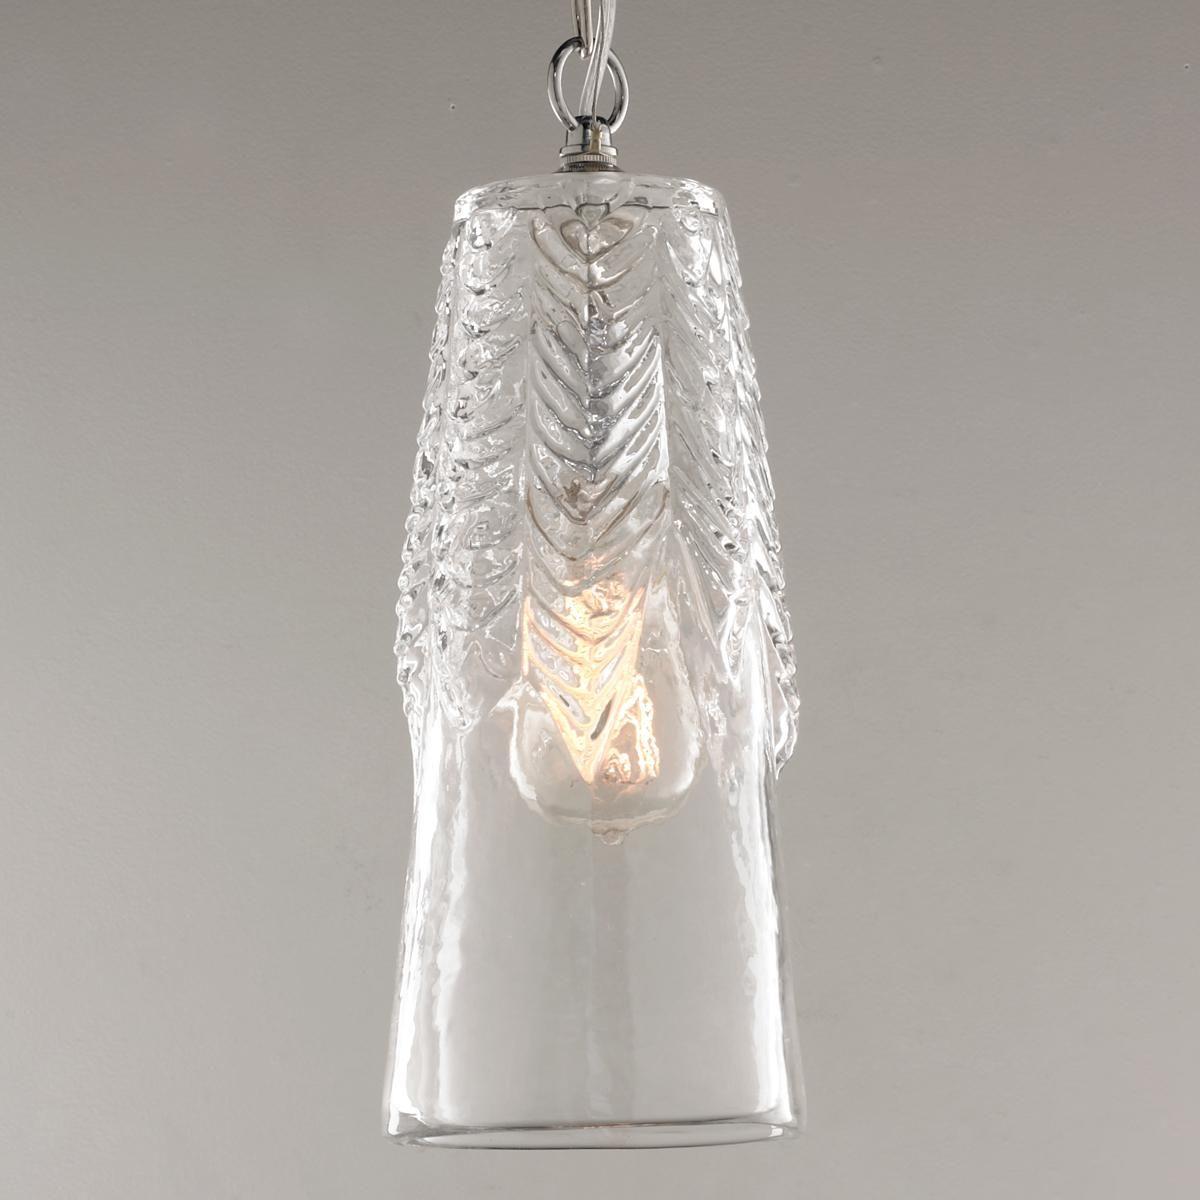 Rippled Glass Cylinder Pendant